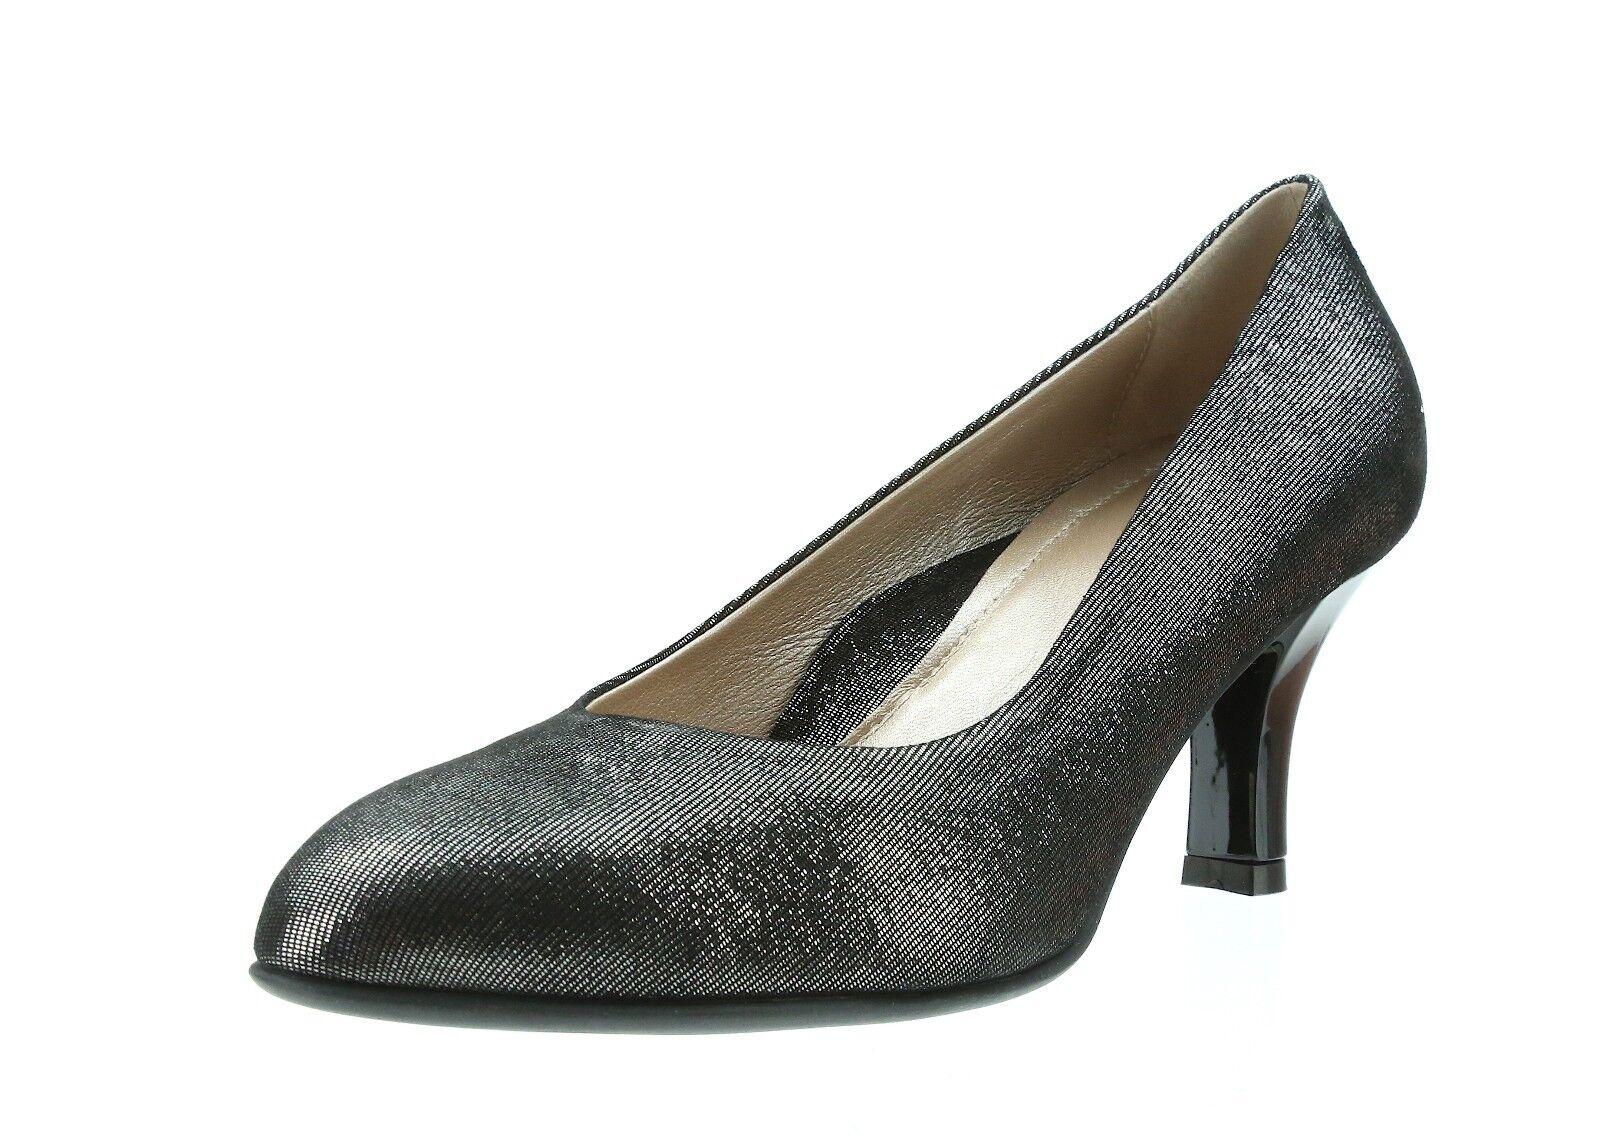 BeautiFeel LOTUS 7704 Silver Mesh Suede Pumps Heels Size 36 EU NEW